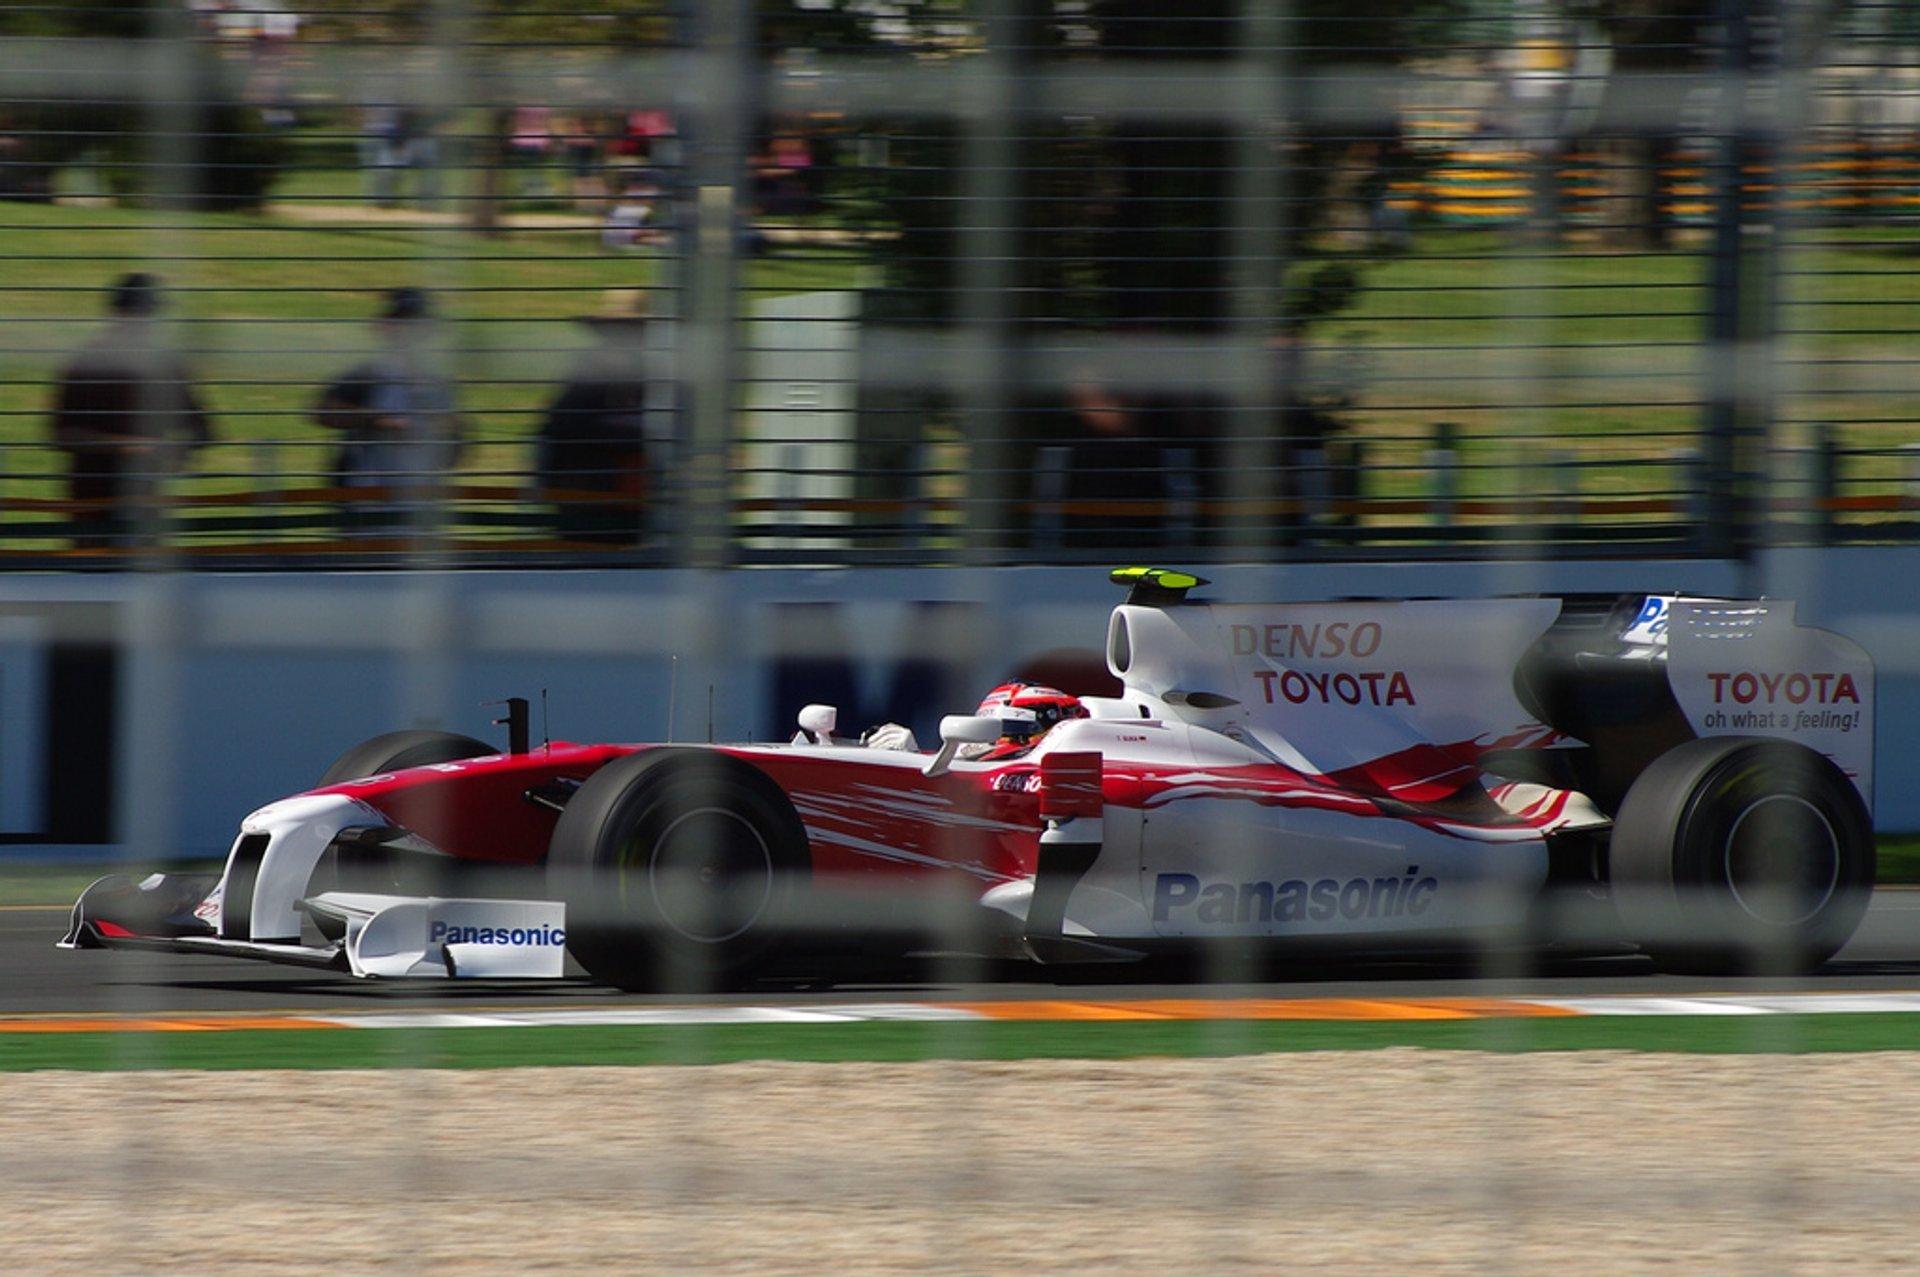 Australian Grand Prix in Melbourne 2019 - Best Time